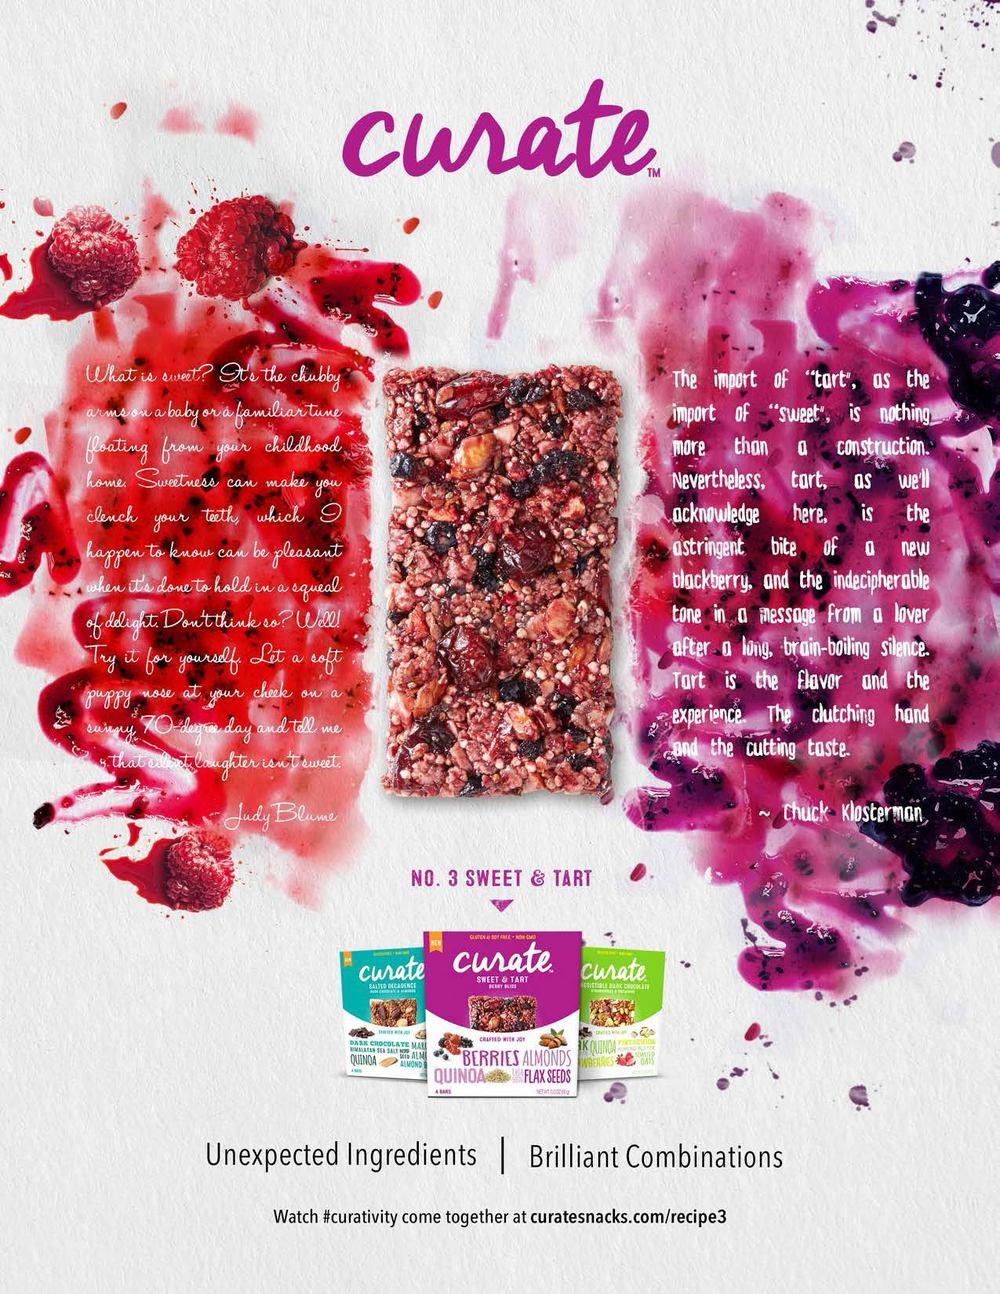 Curate Launch Campaign - Nick Schultz